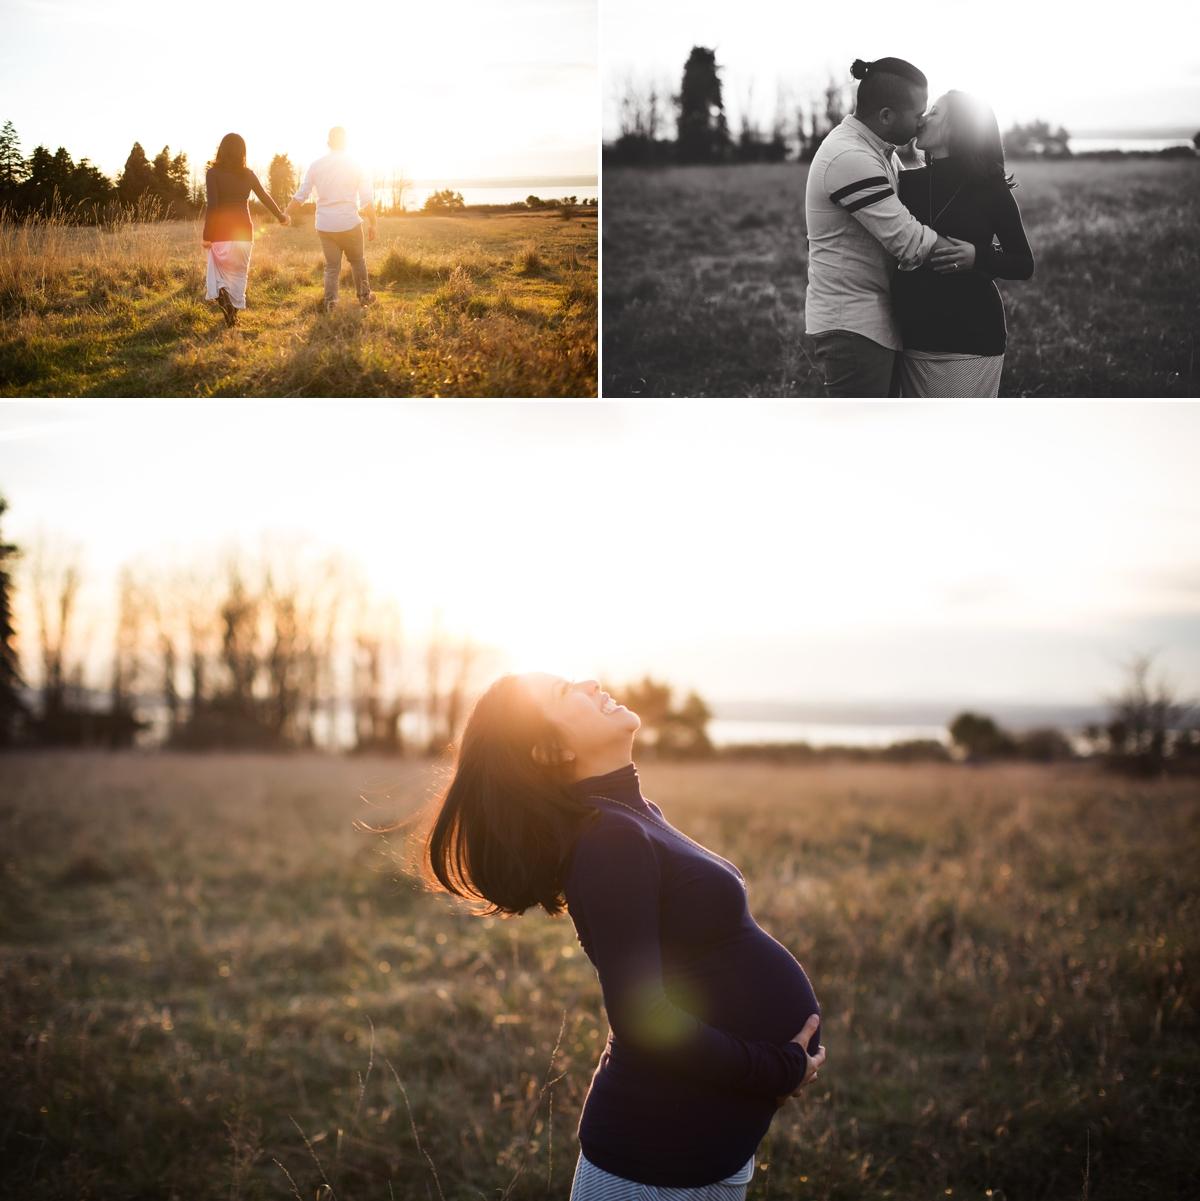 elena_s_blair_seattle_maternity_photography 5.jpg